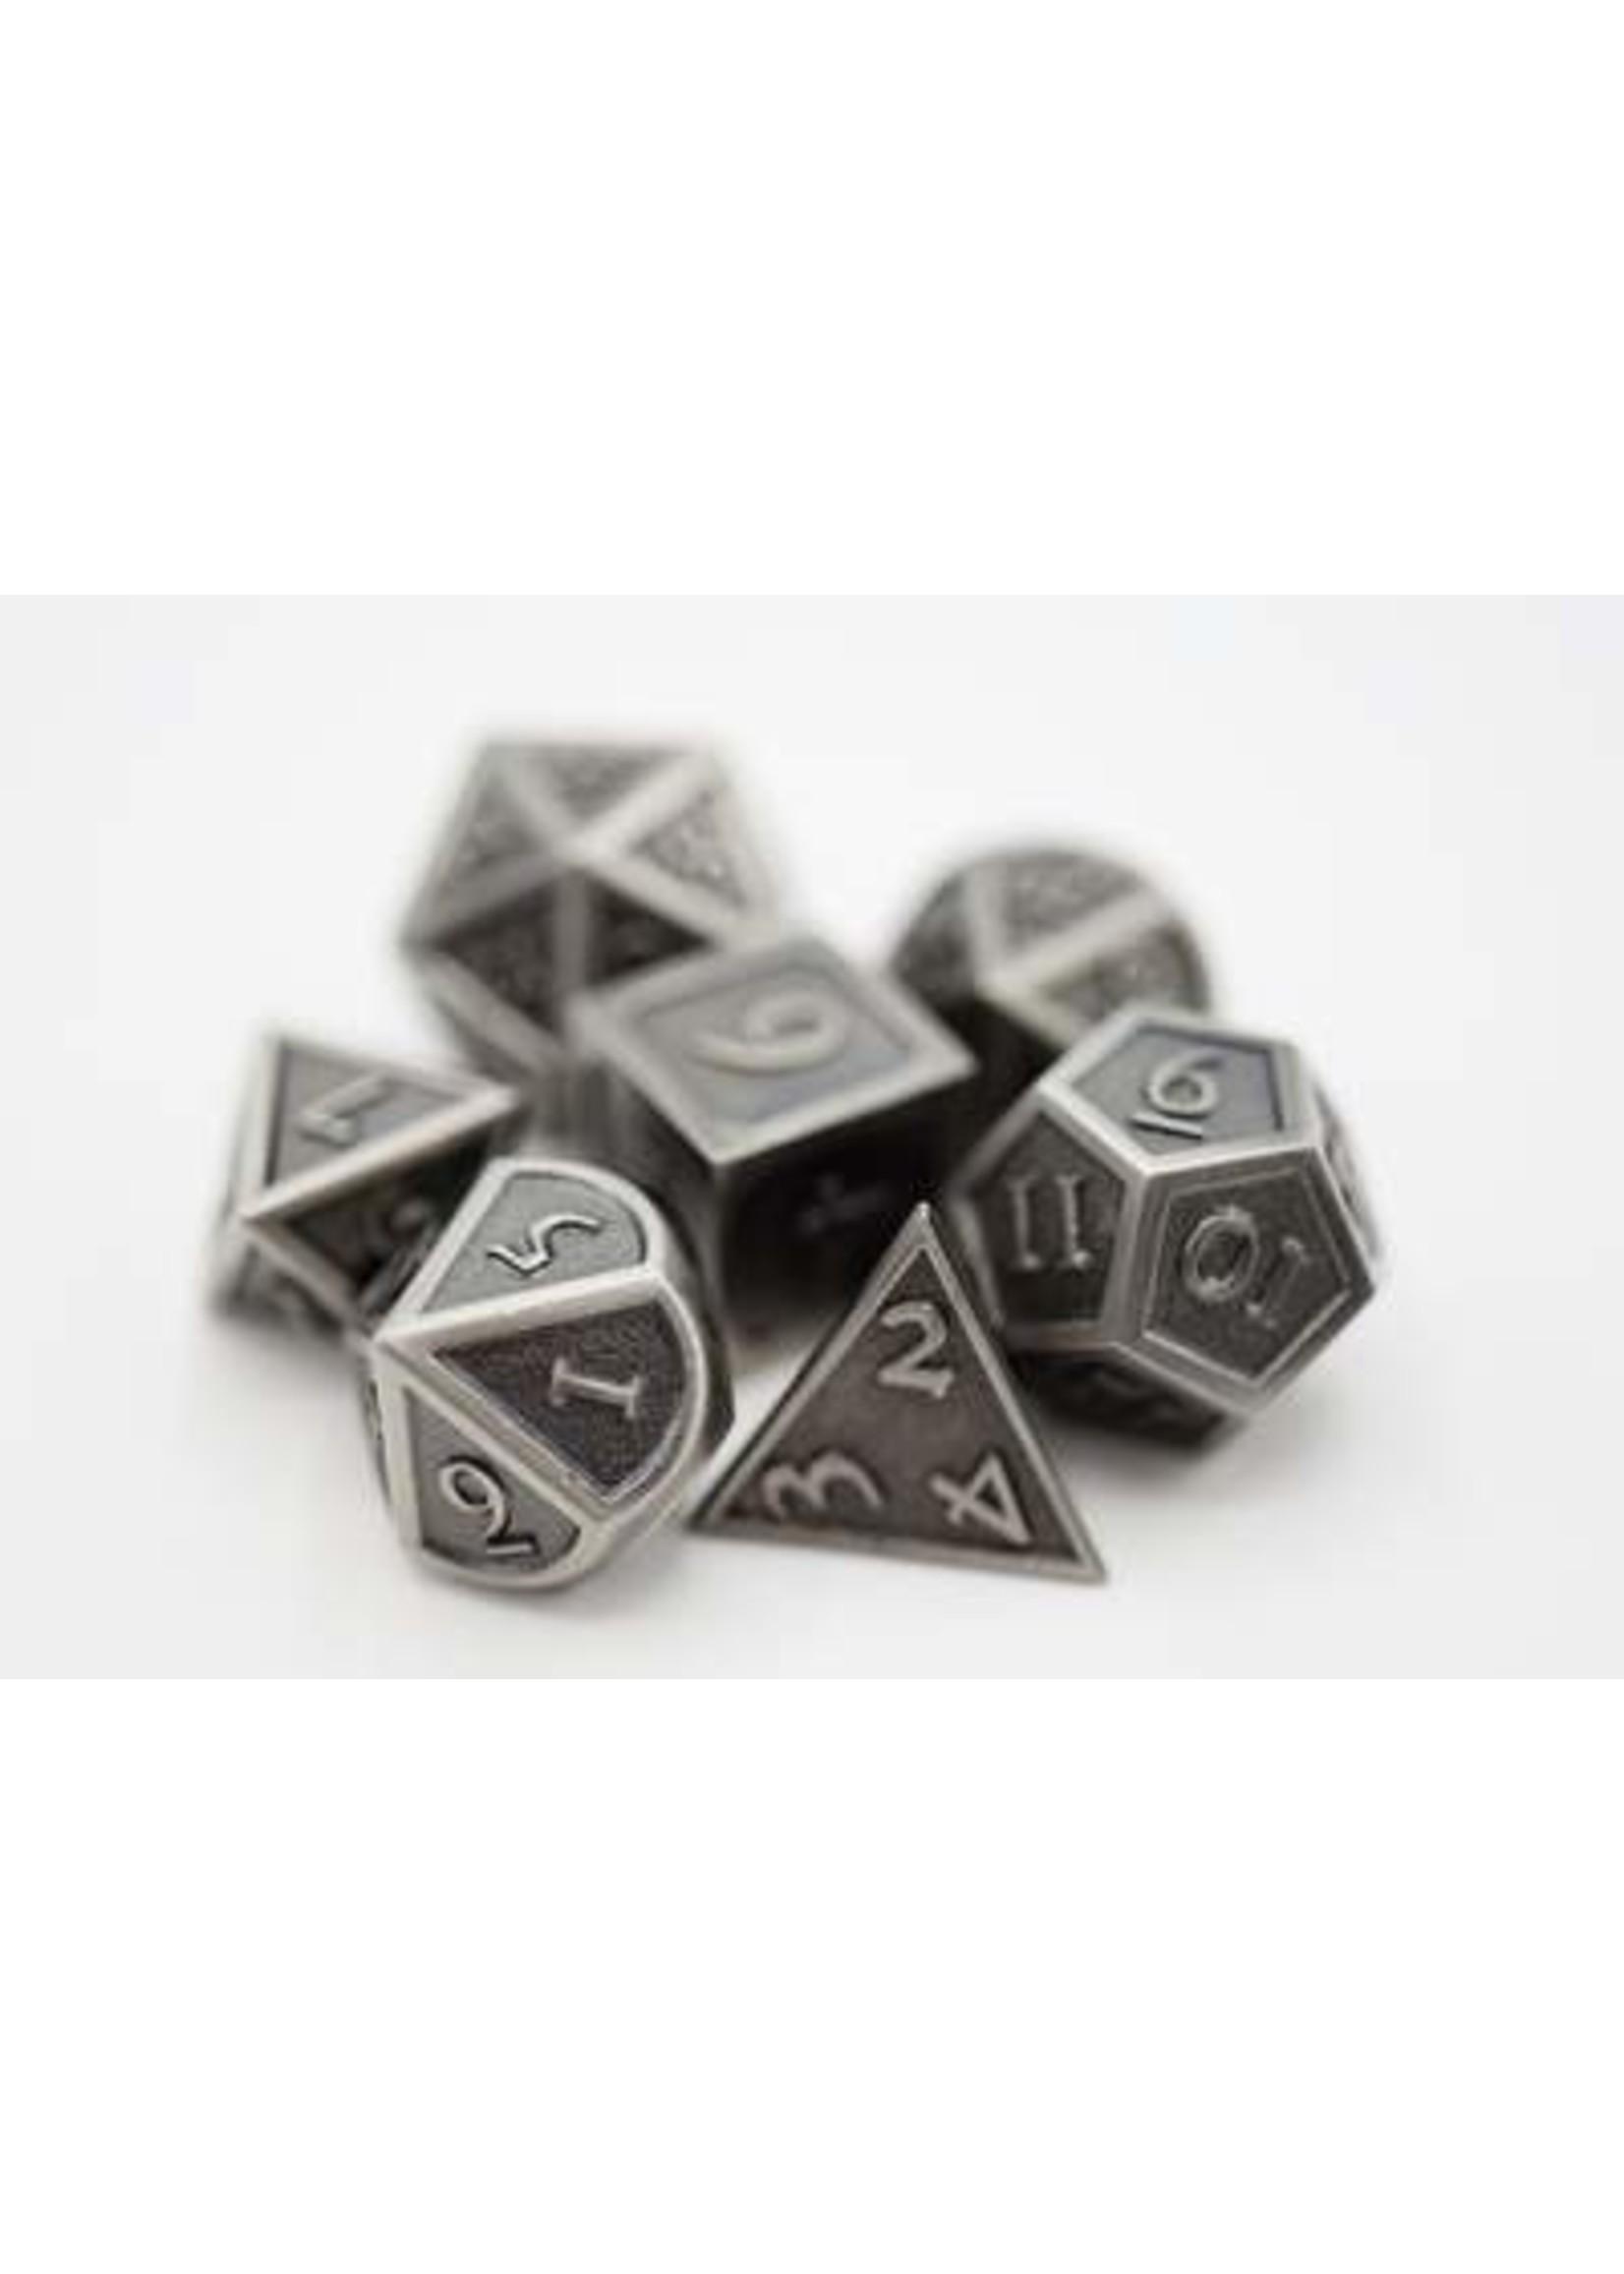 Embossed Antique Silver Metal RPG Dice Set